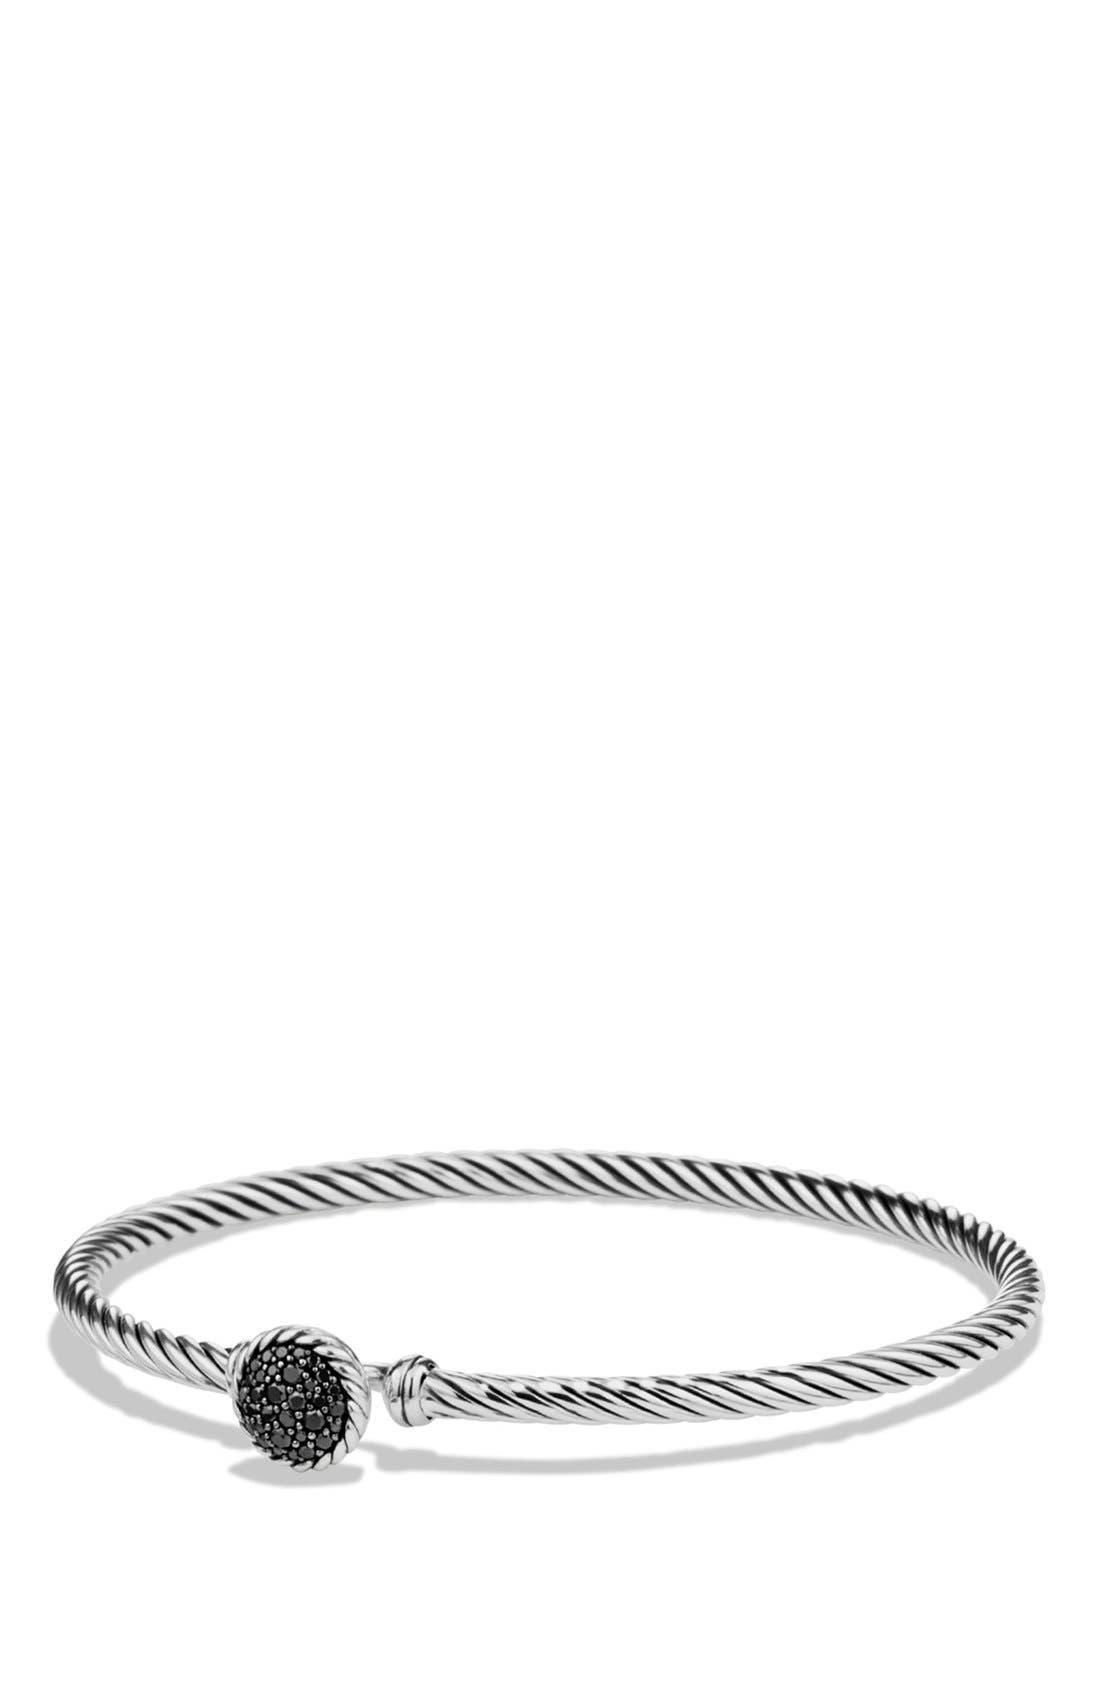 'Châtelaine' Bracelet with Diamonds,                         Main,                         color, Black Diamond